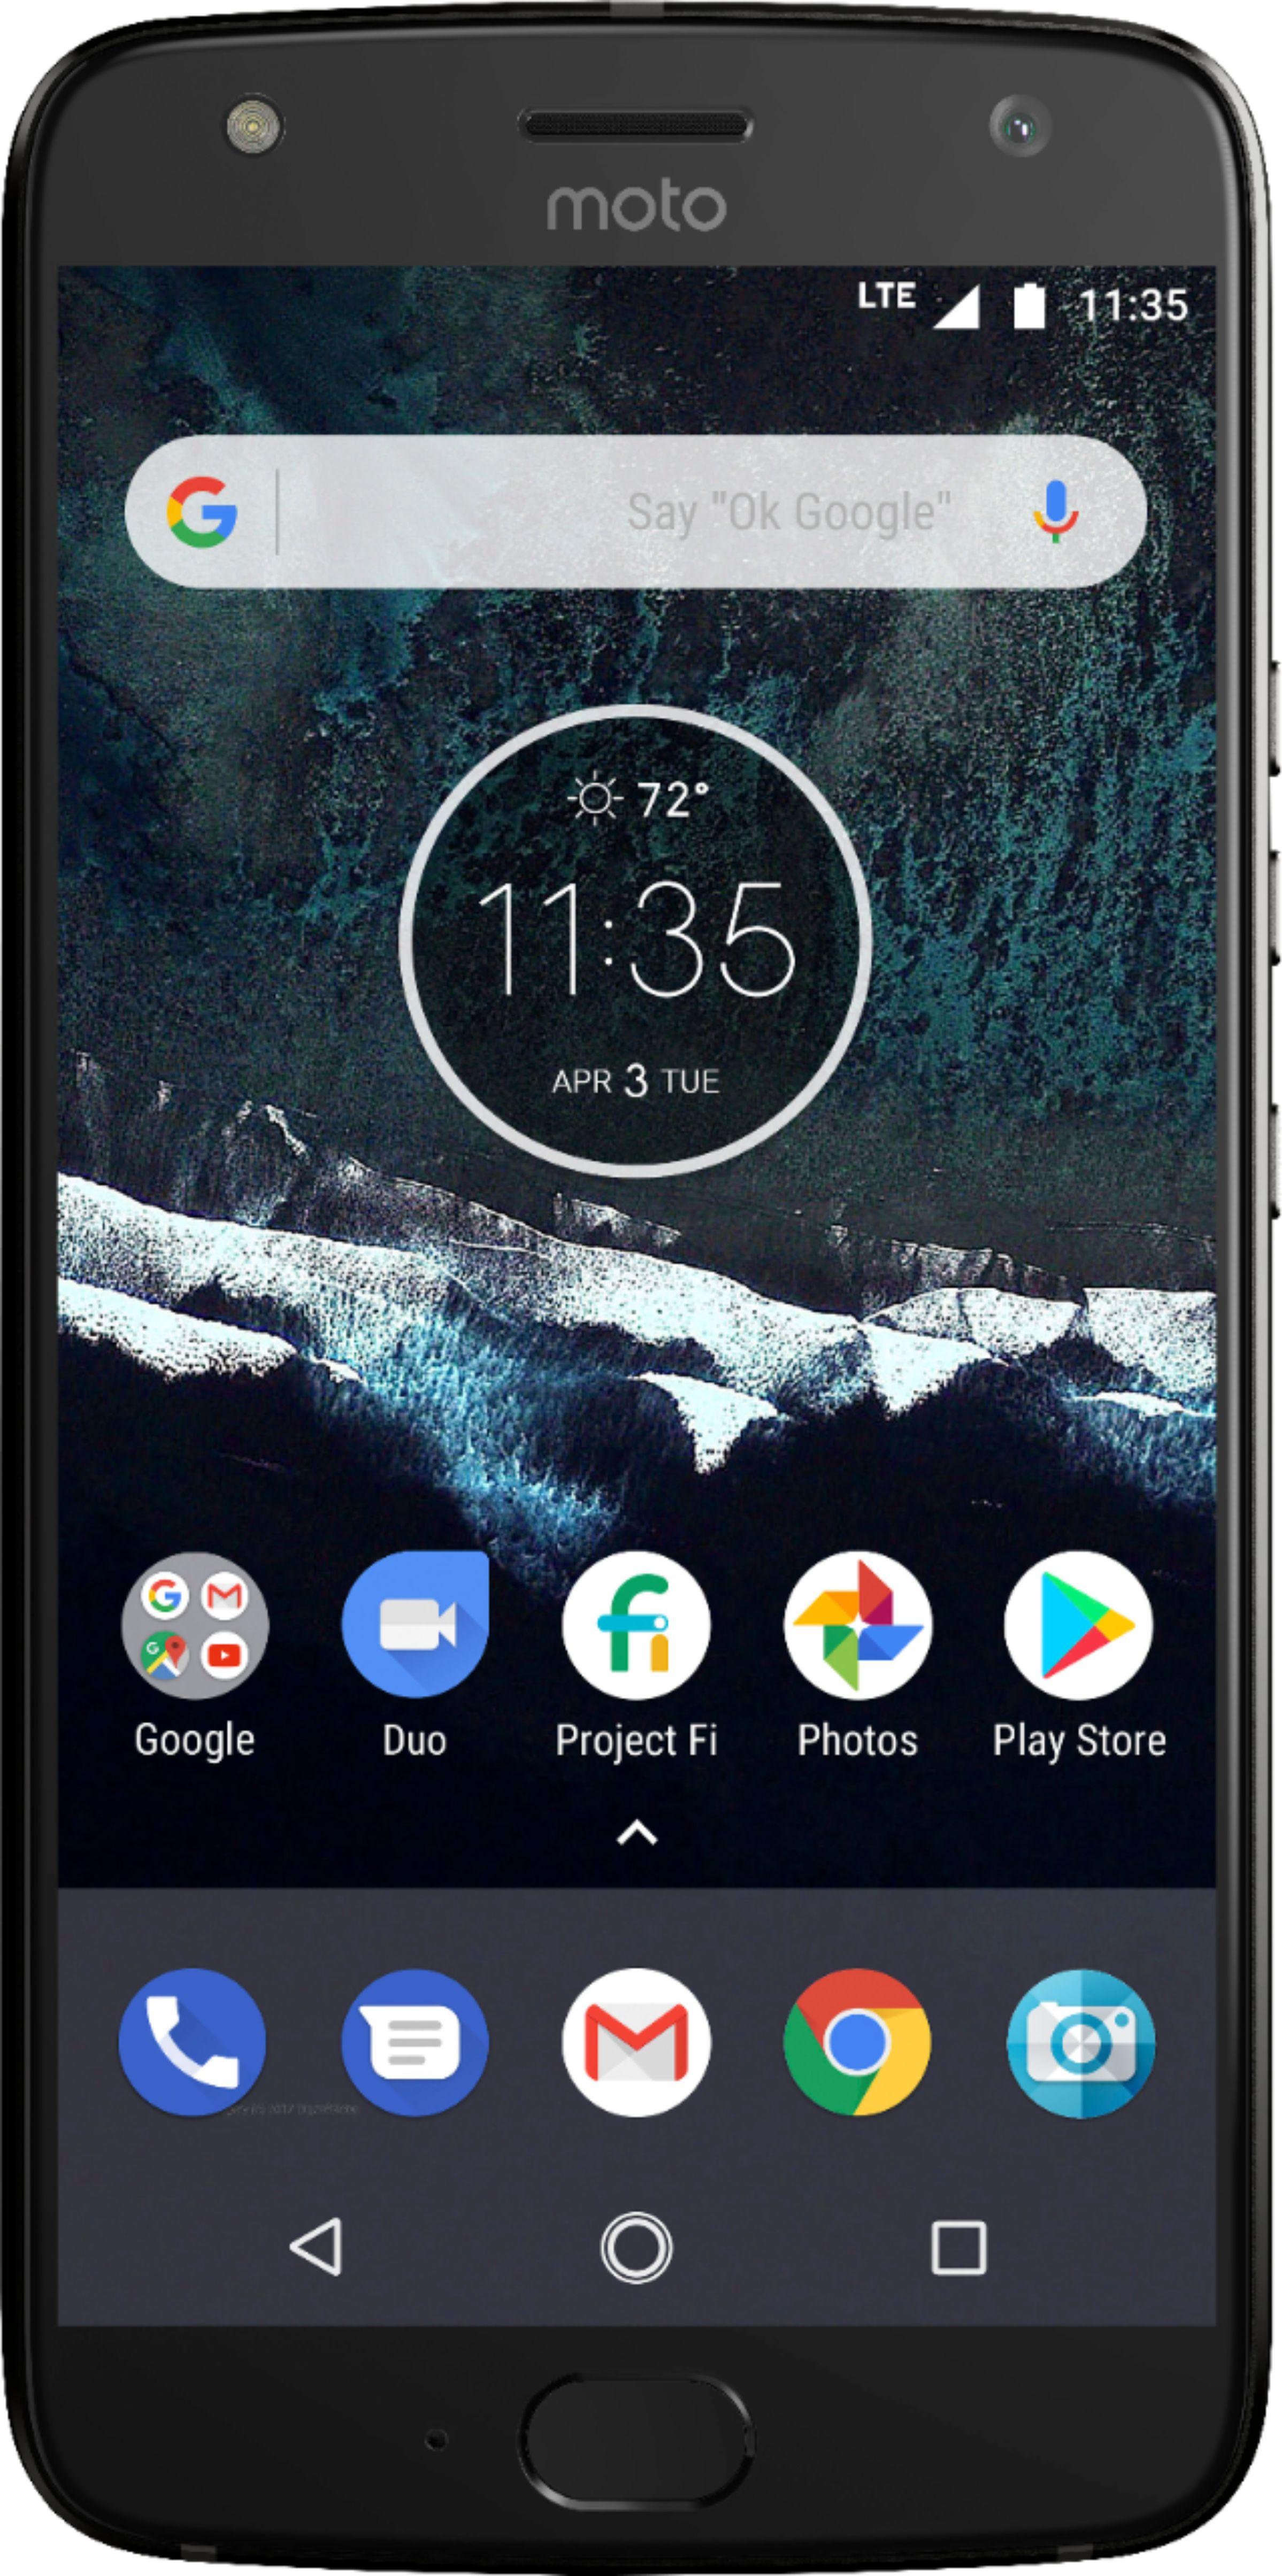 32gb Moto X4 Unlocked Phone 40 Cricket Wireless Card 3